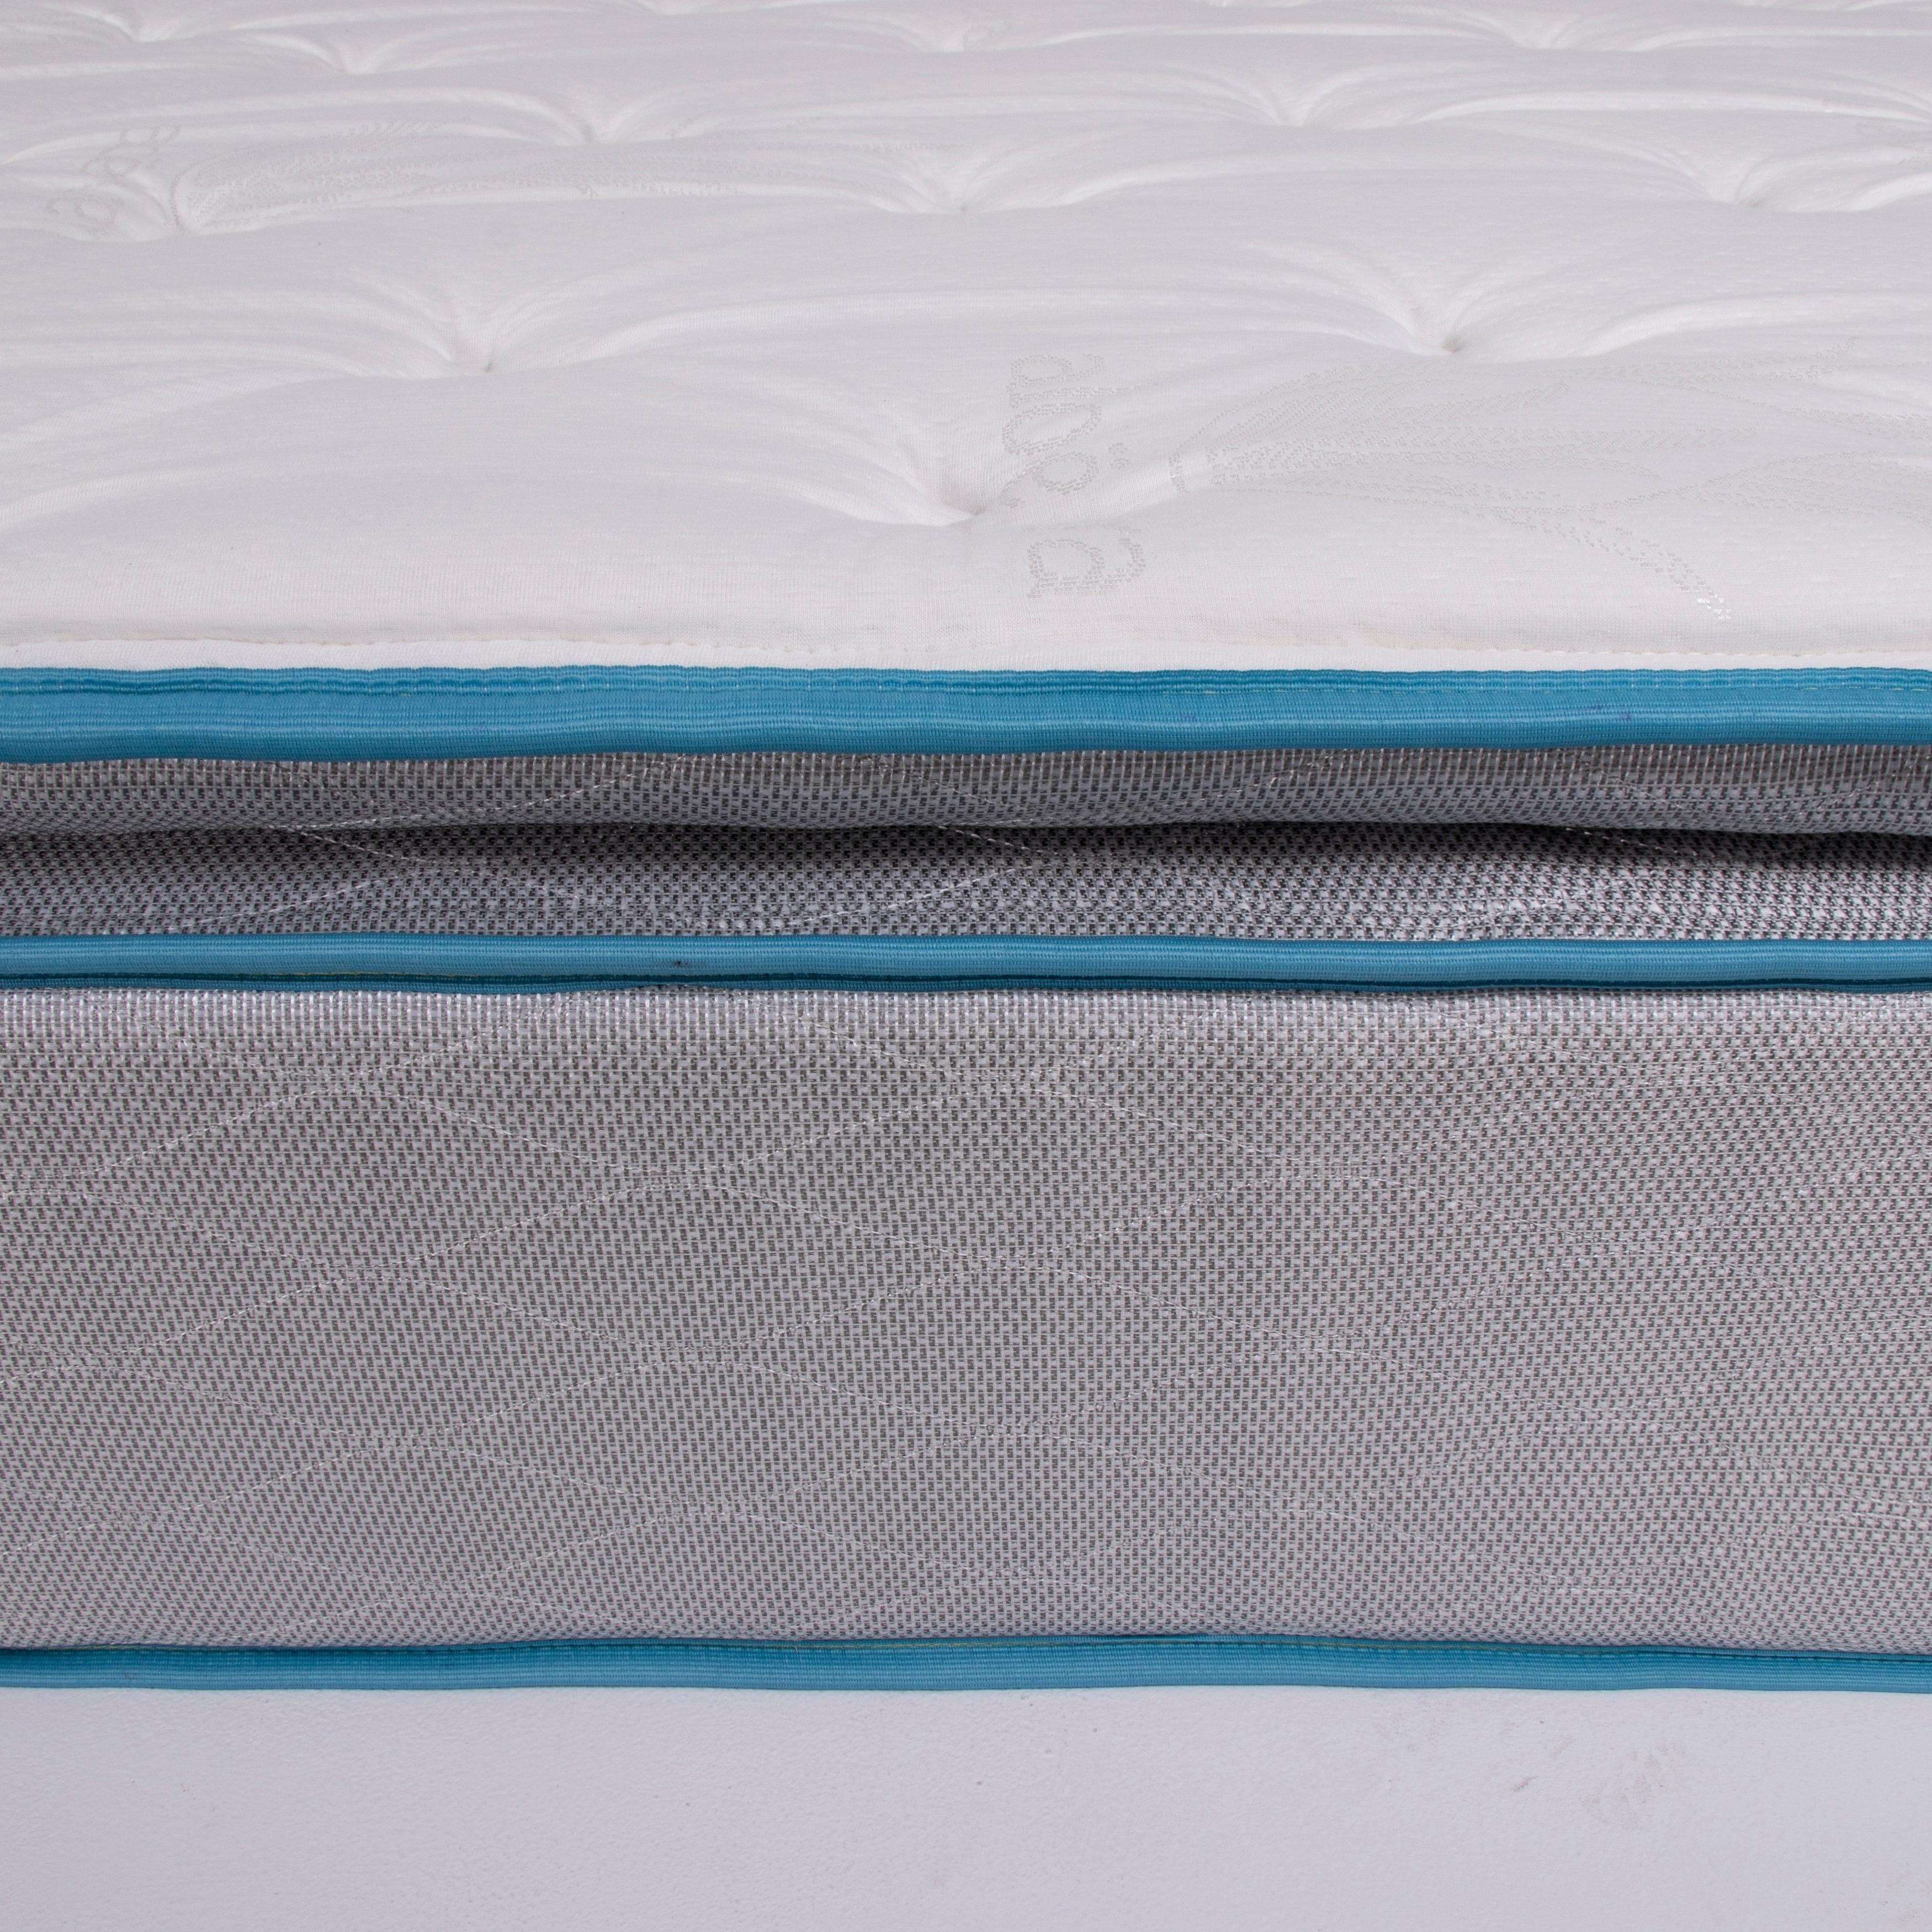 Shop Nuform Essence Quilted Pillow Top 11 Inch Plush Foam Mattress